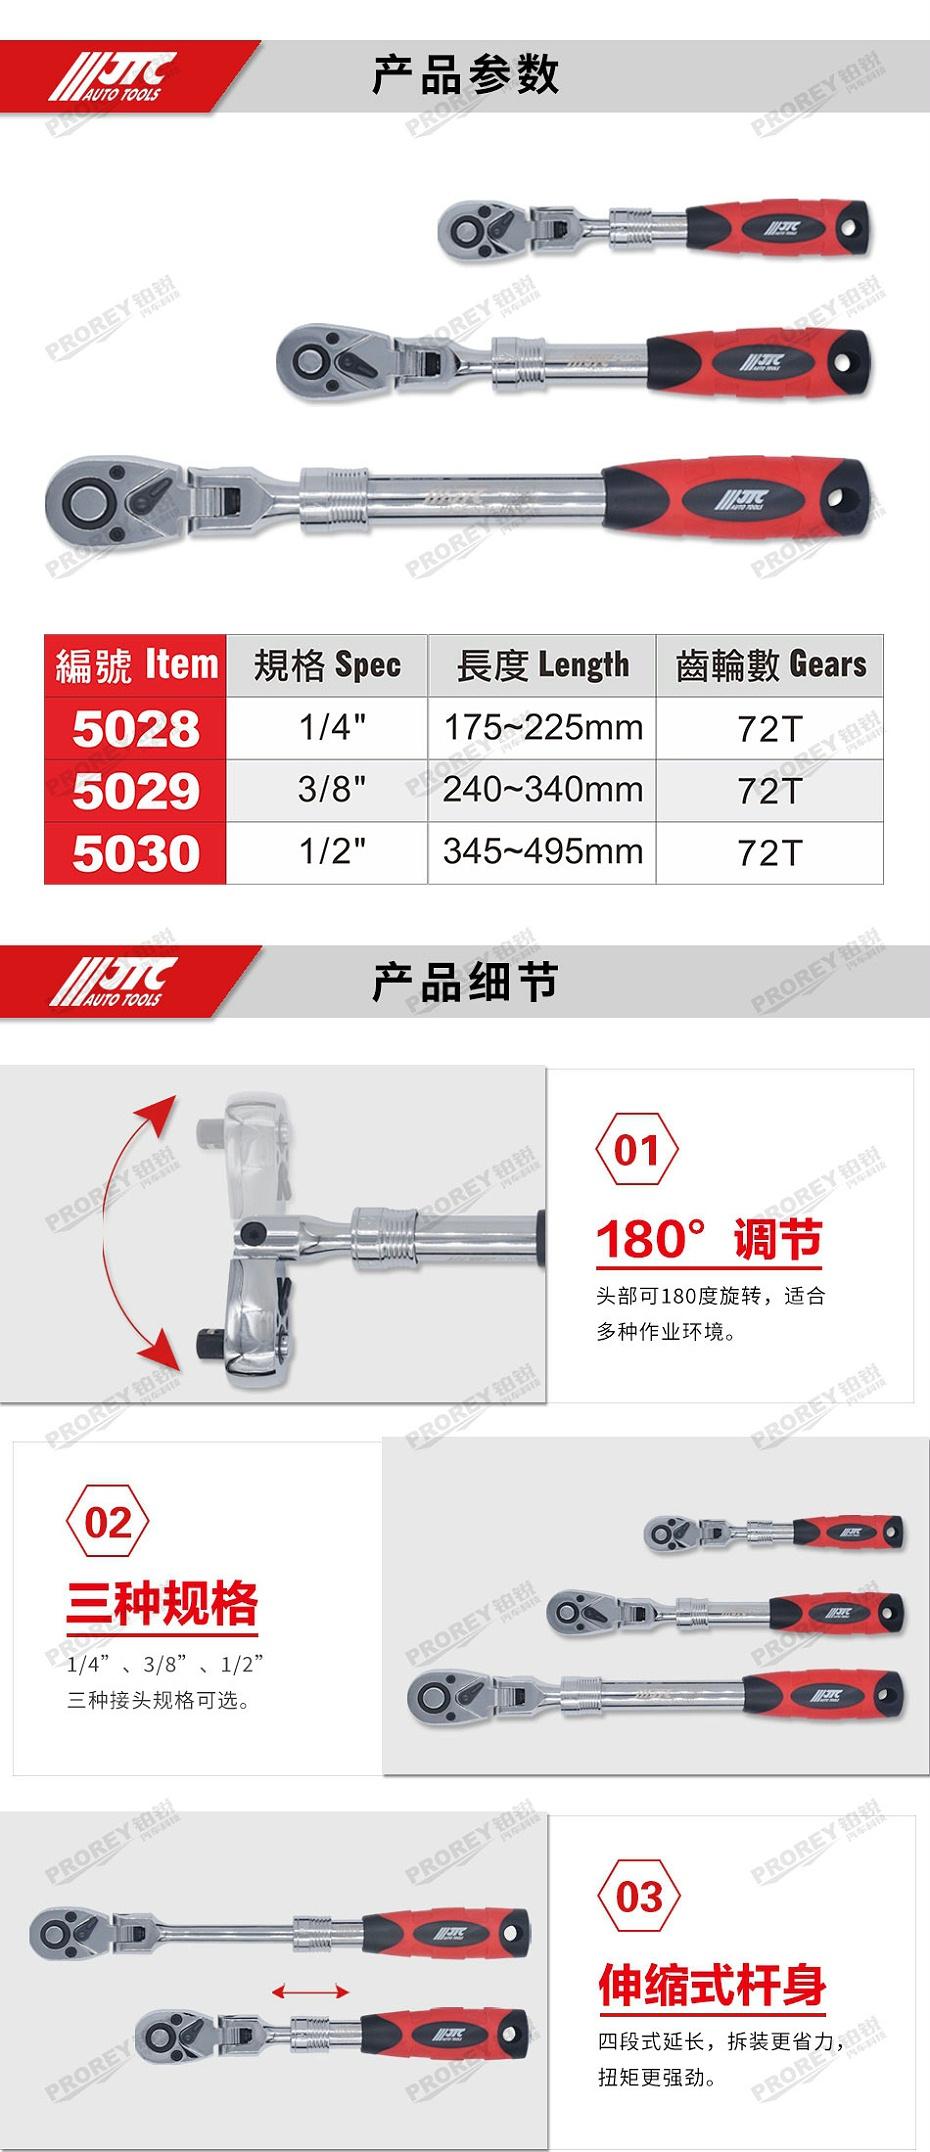 GW-130032560-JTC 5028 1-4英寸伸缩摇头快速棘轮扳手-1